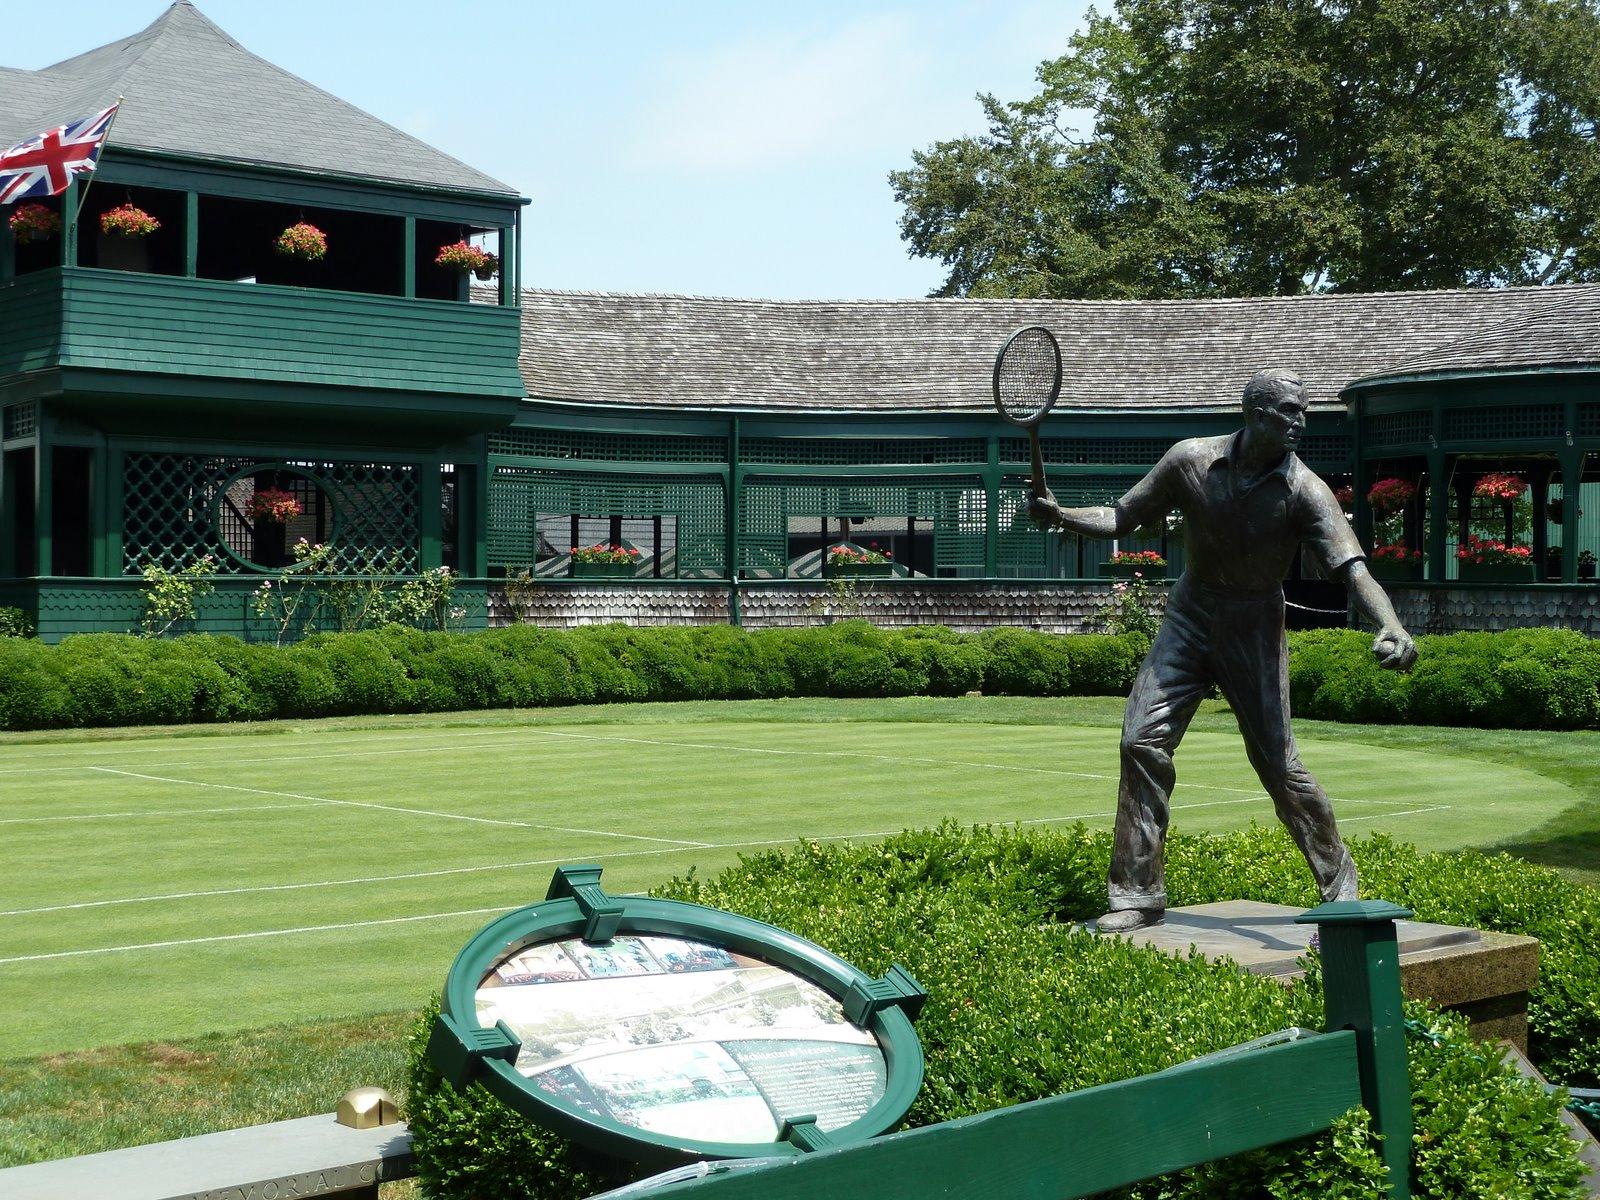 center court tennis